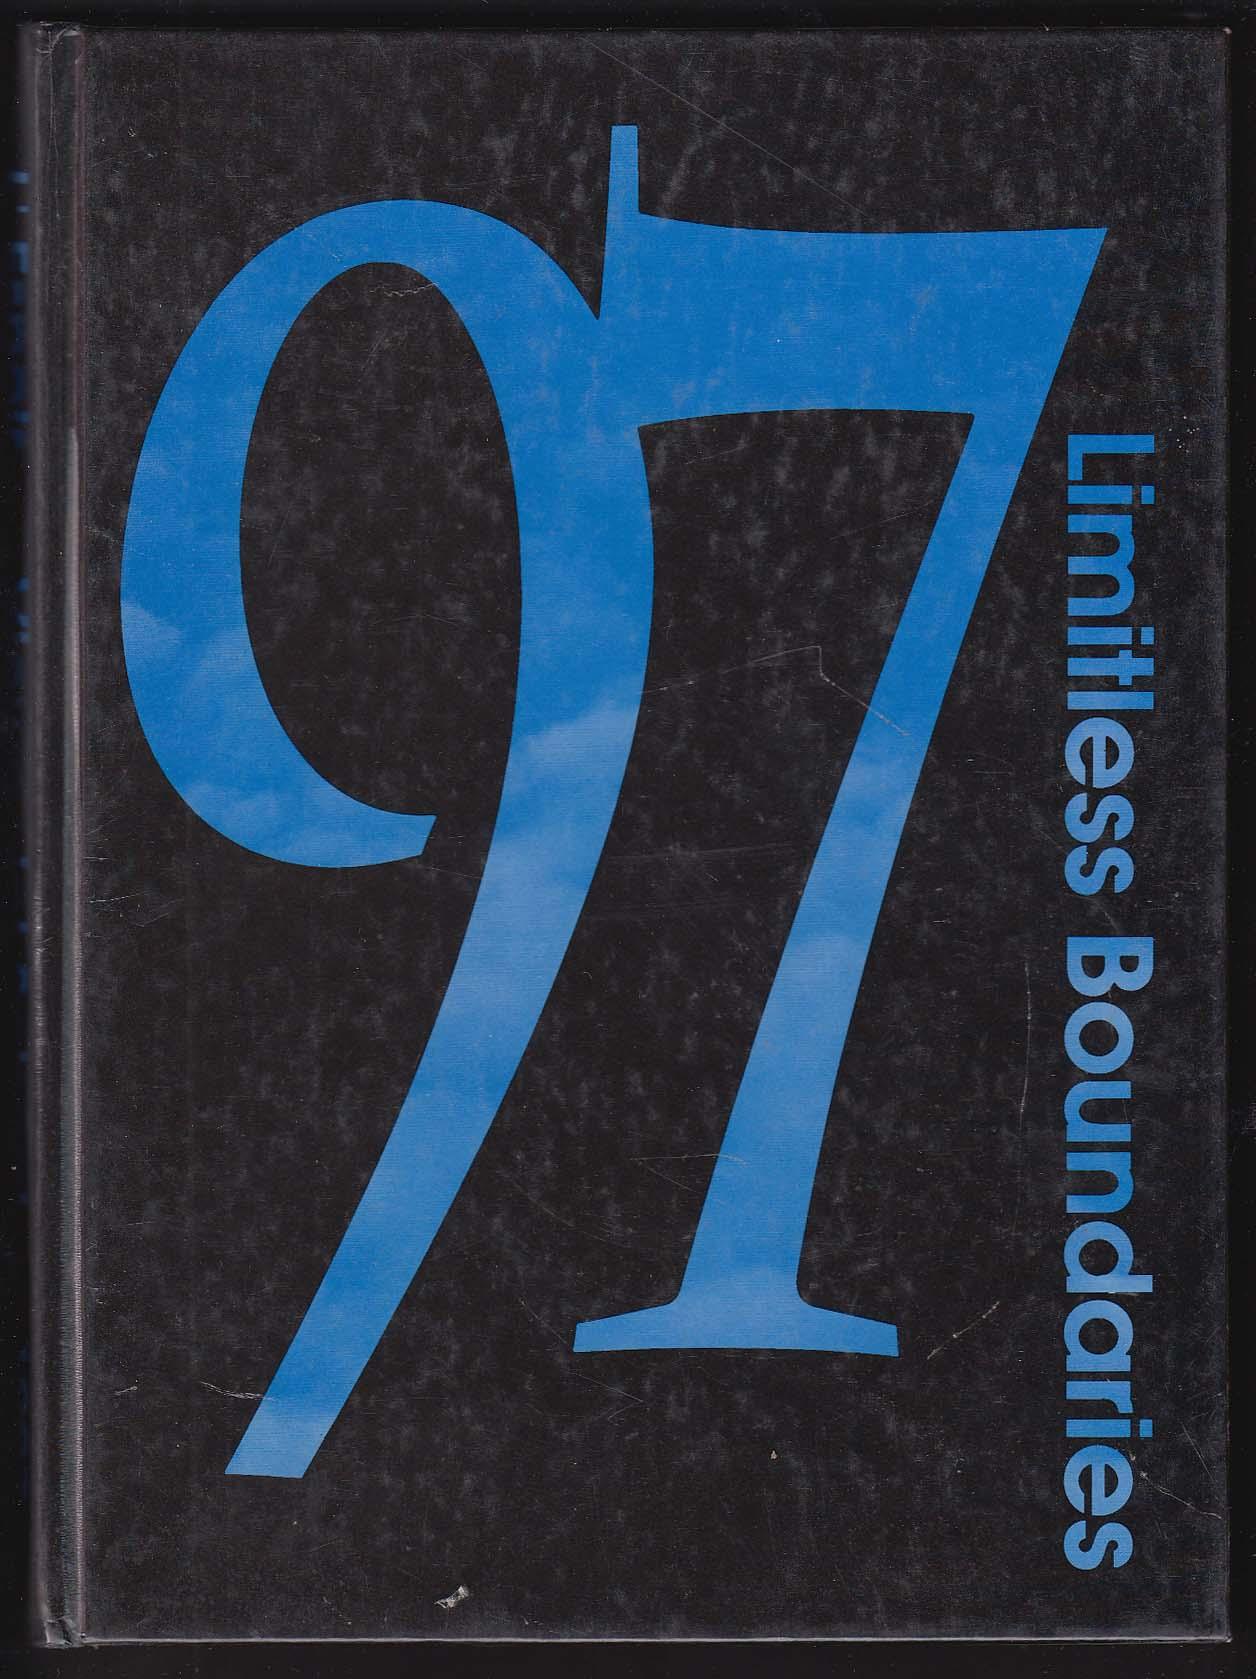 L'Espoir Viewpoint School 1997 Yearbook Calabasas California